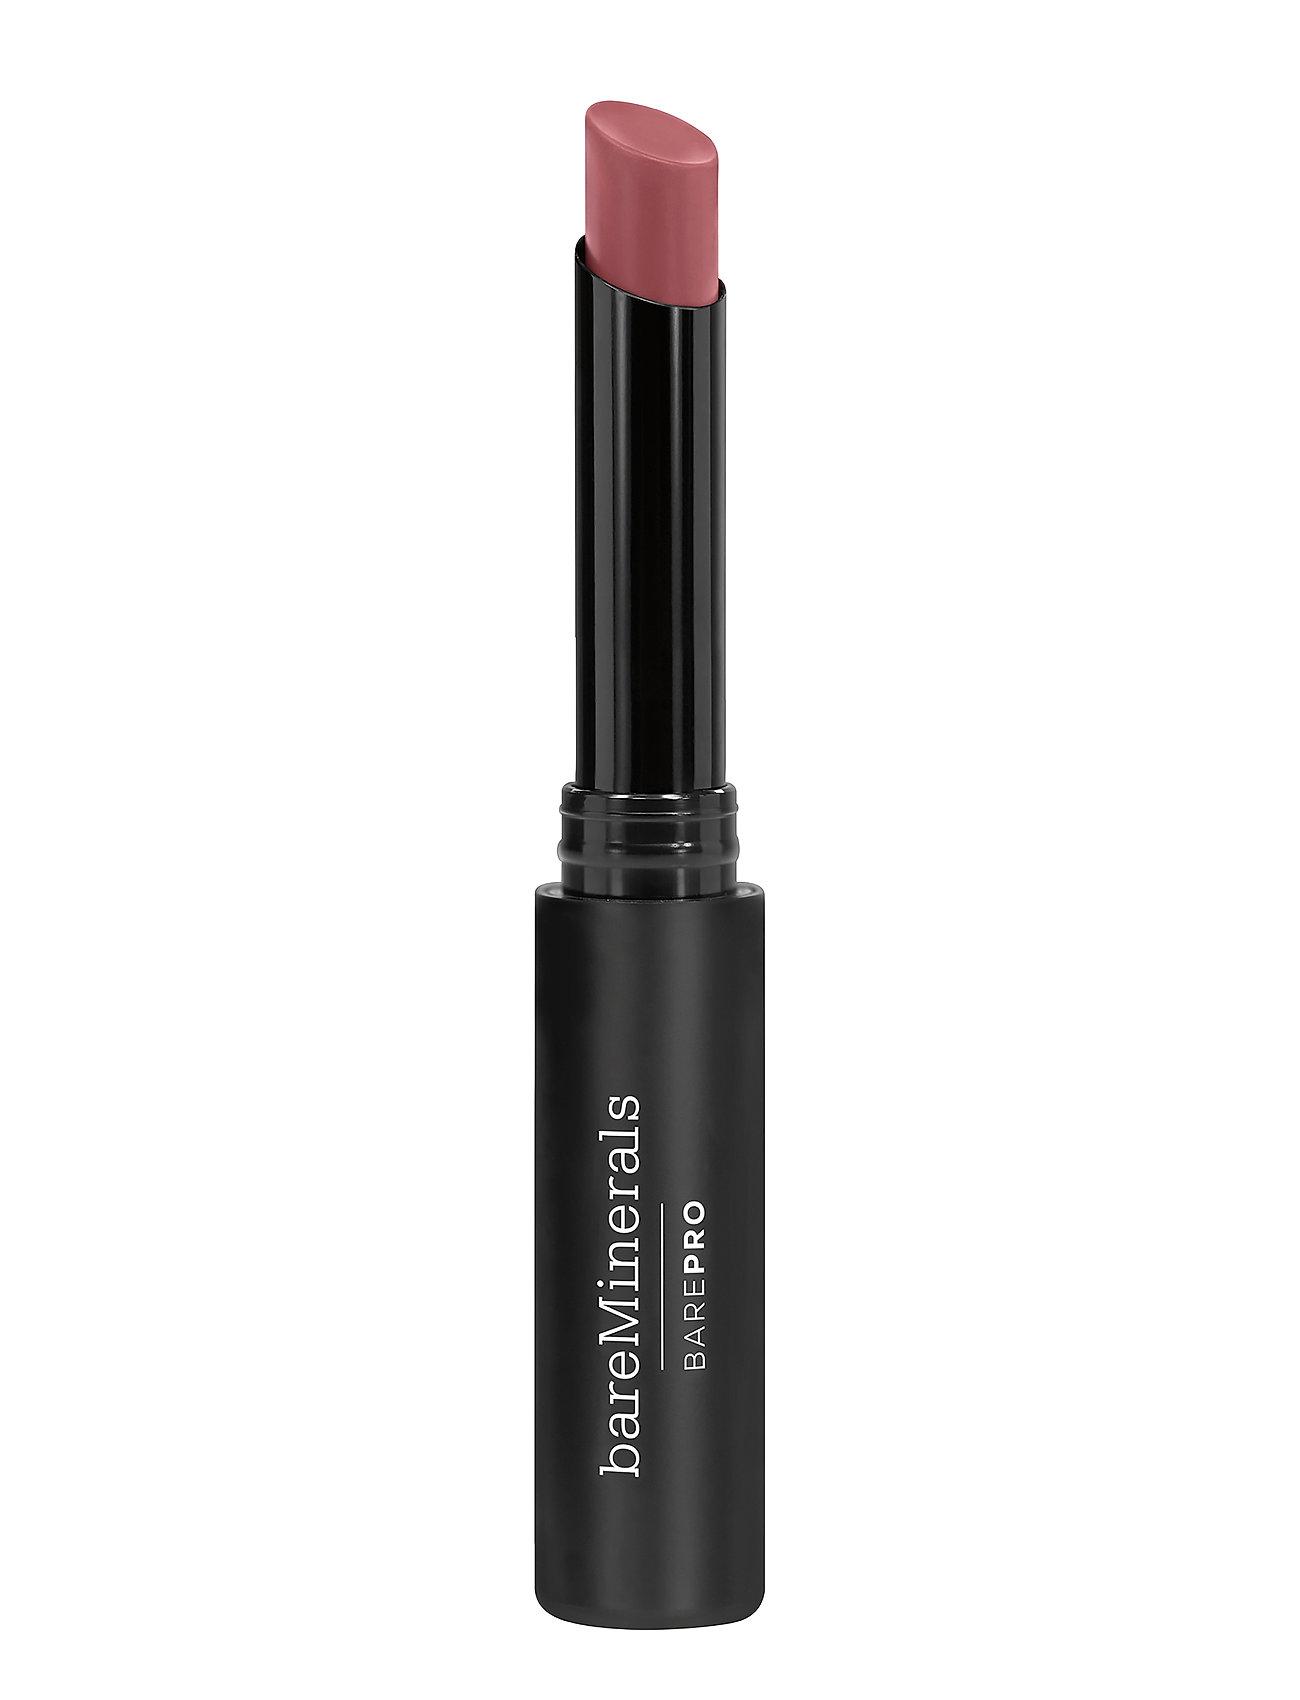 Image of Barepro Longwear Lipstick Petal Læbestift Makeup Lyserød BareMinerals (3138616943)